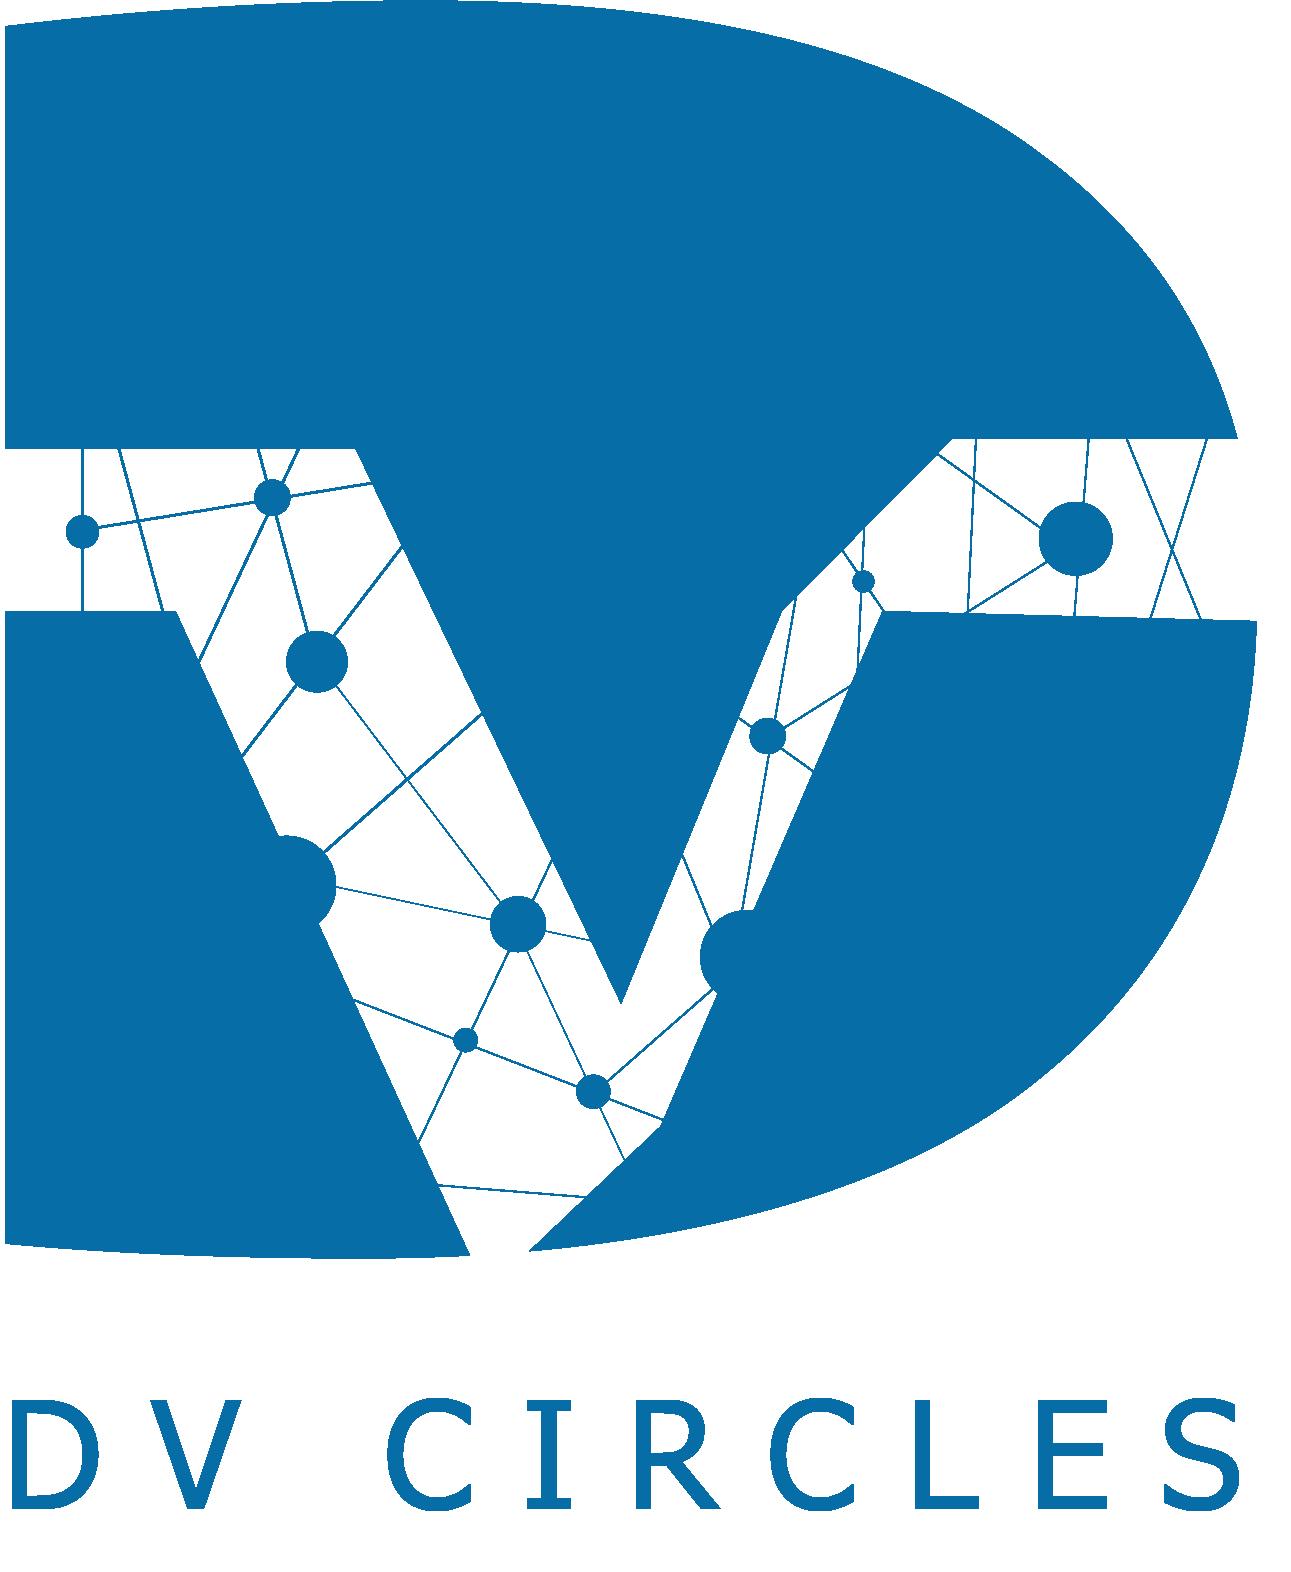 DvCircles